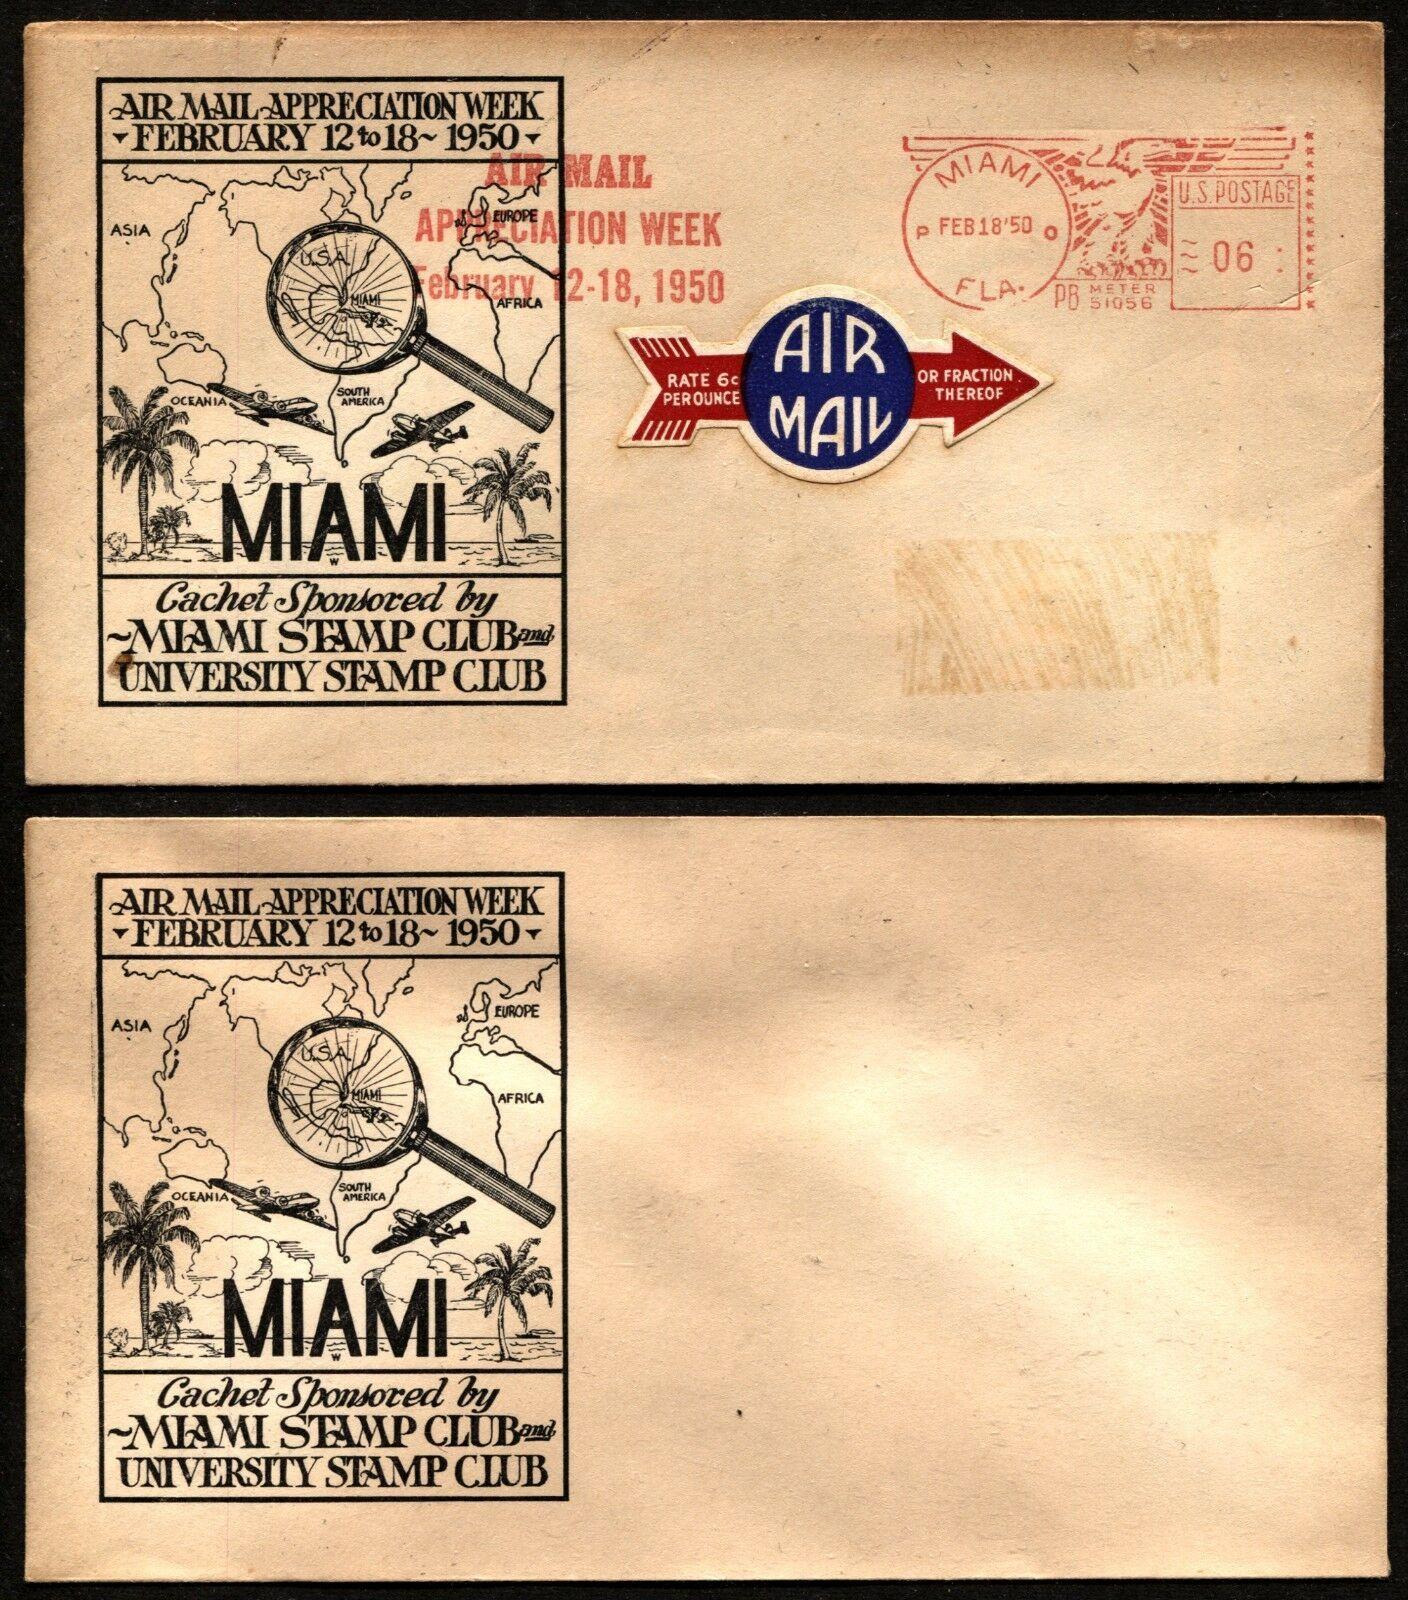 Air Mail Appreciation Week 1950 MIAMI Stamp Club Mailomat Stationery Used & Mint